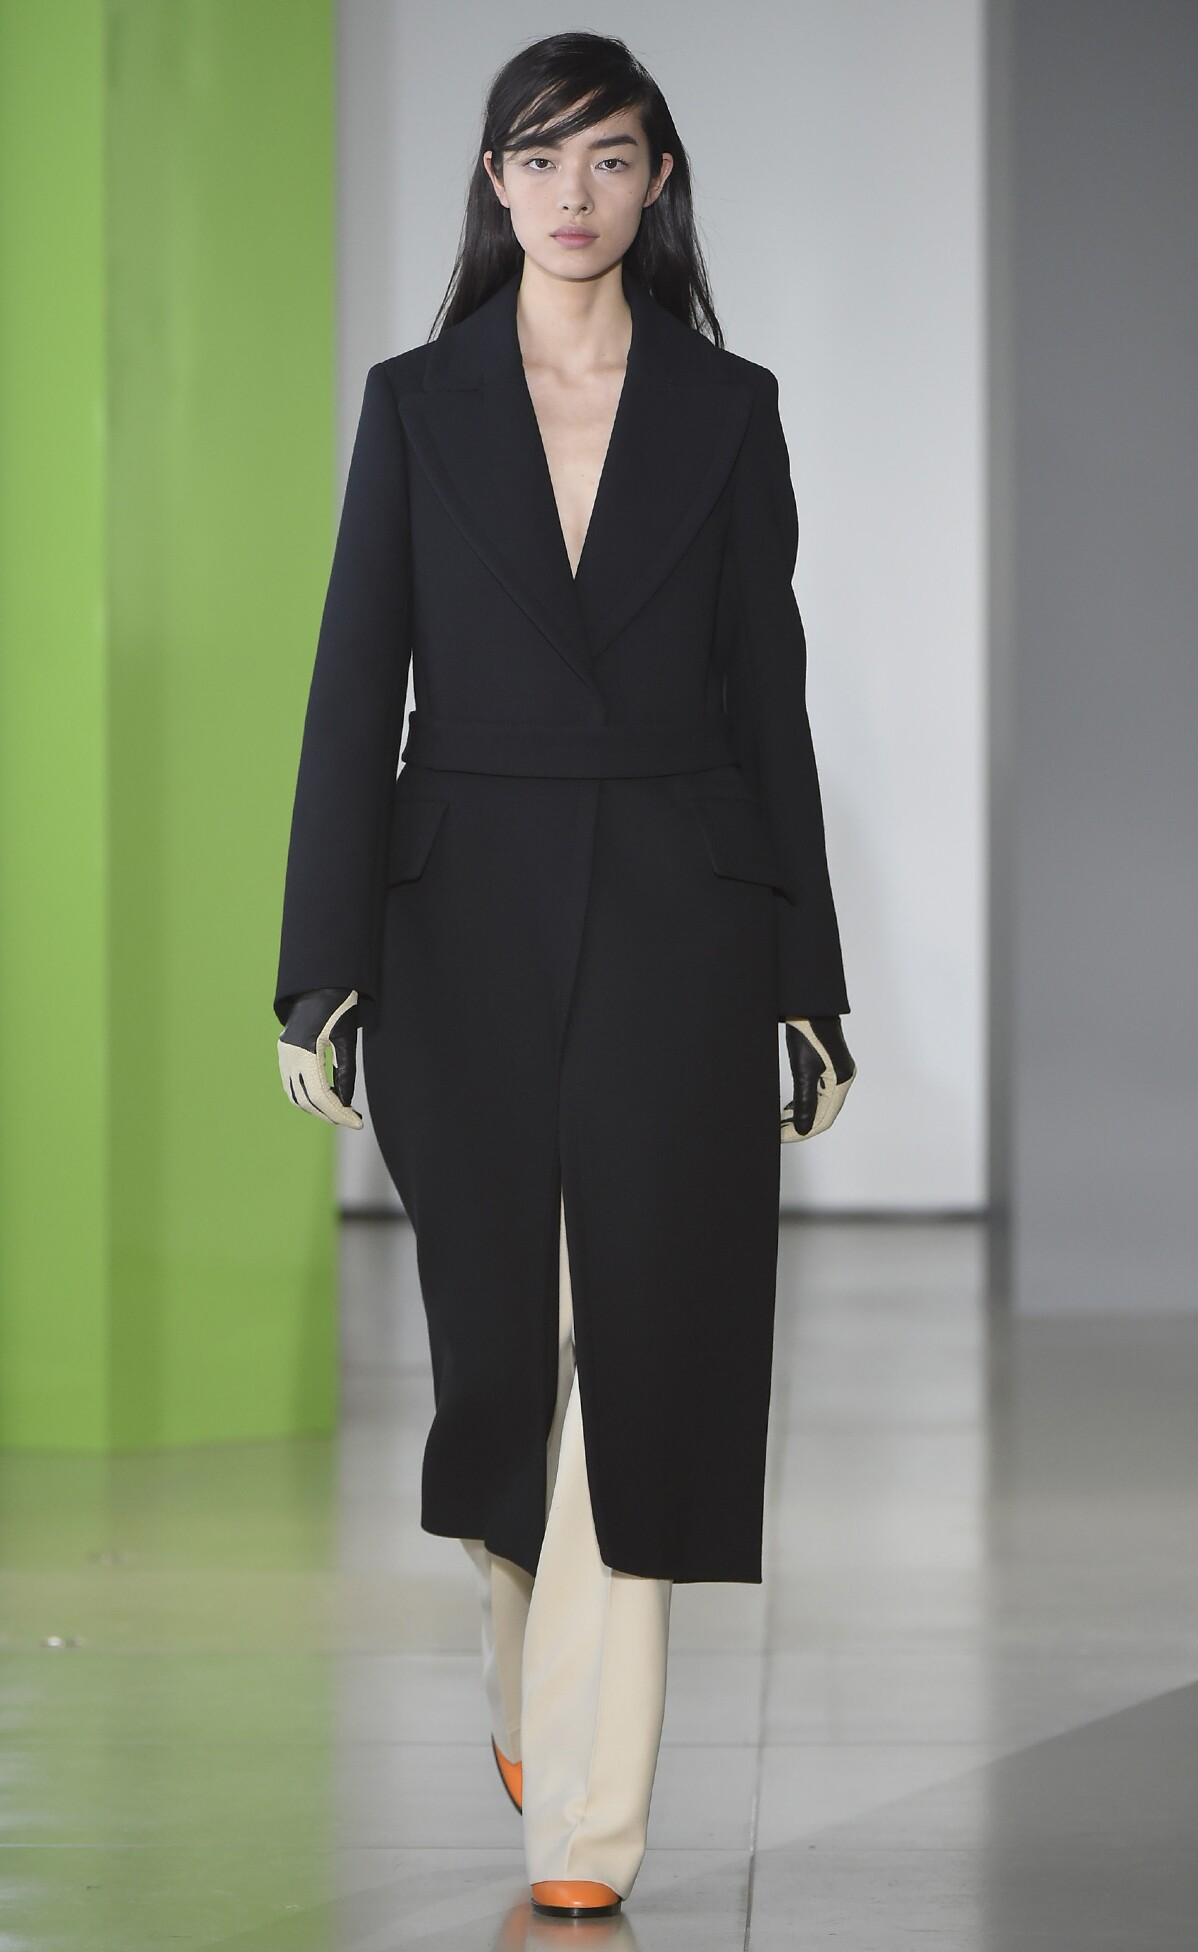 Jil Sander Collection Winter 2015 Catwalk